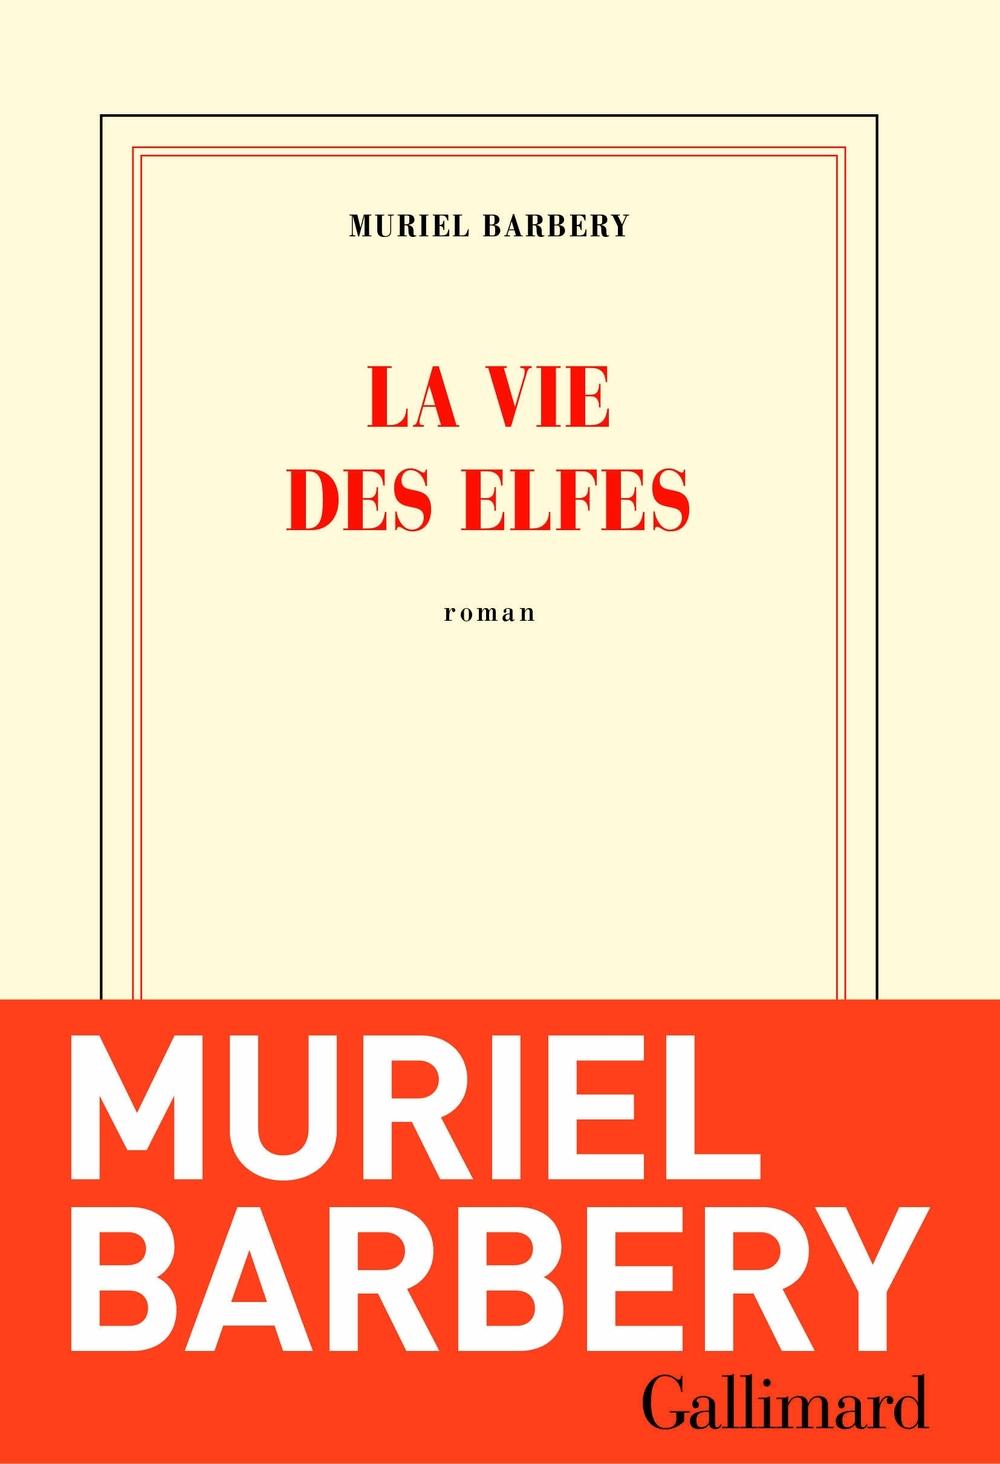 La vie des elfes | Barbery, Muriel